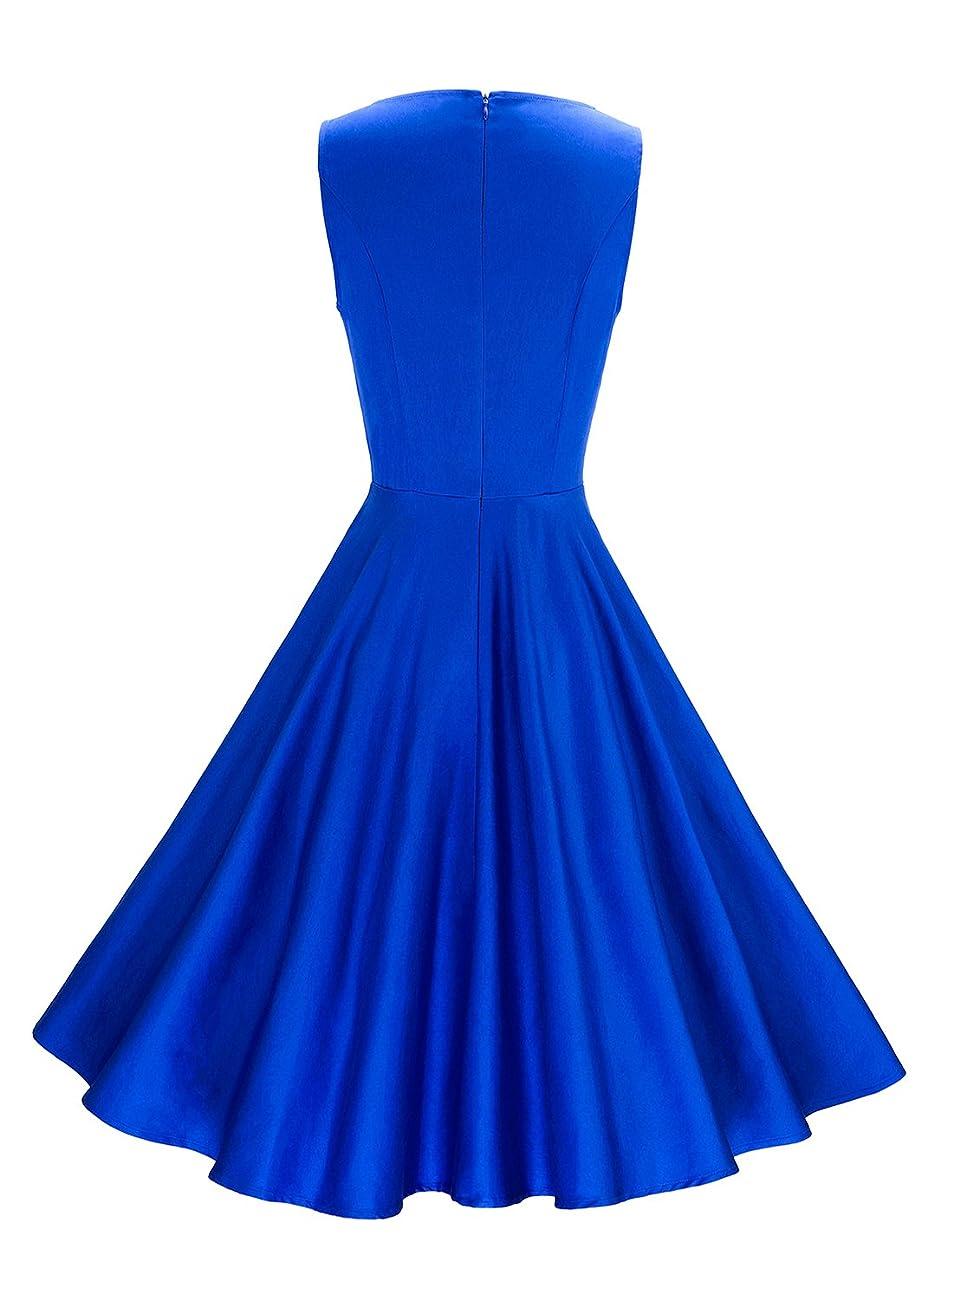 Anni Coco Women's Classy Audrey Hepburn 1950s Vintage Rockabilly Swing Dress blue 2